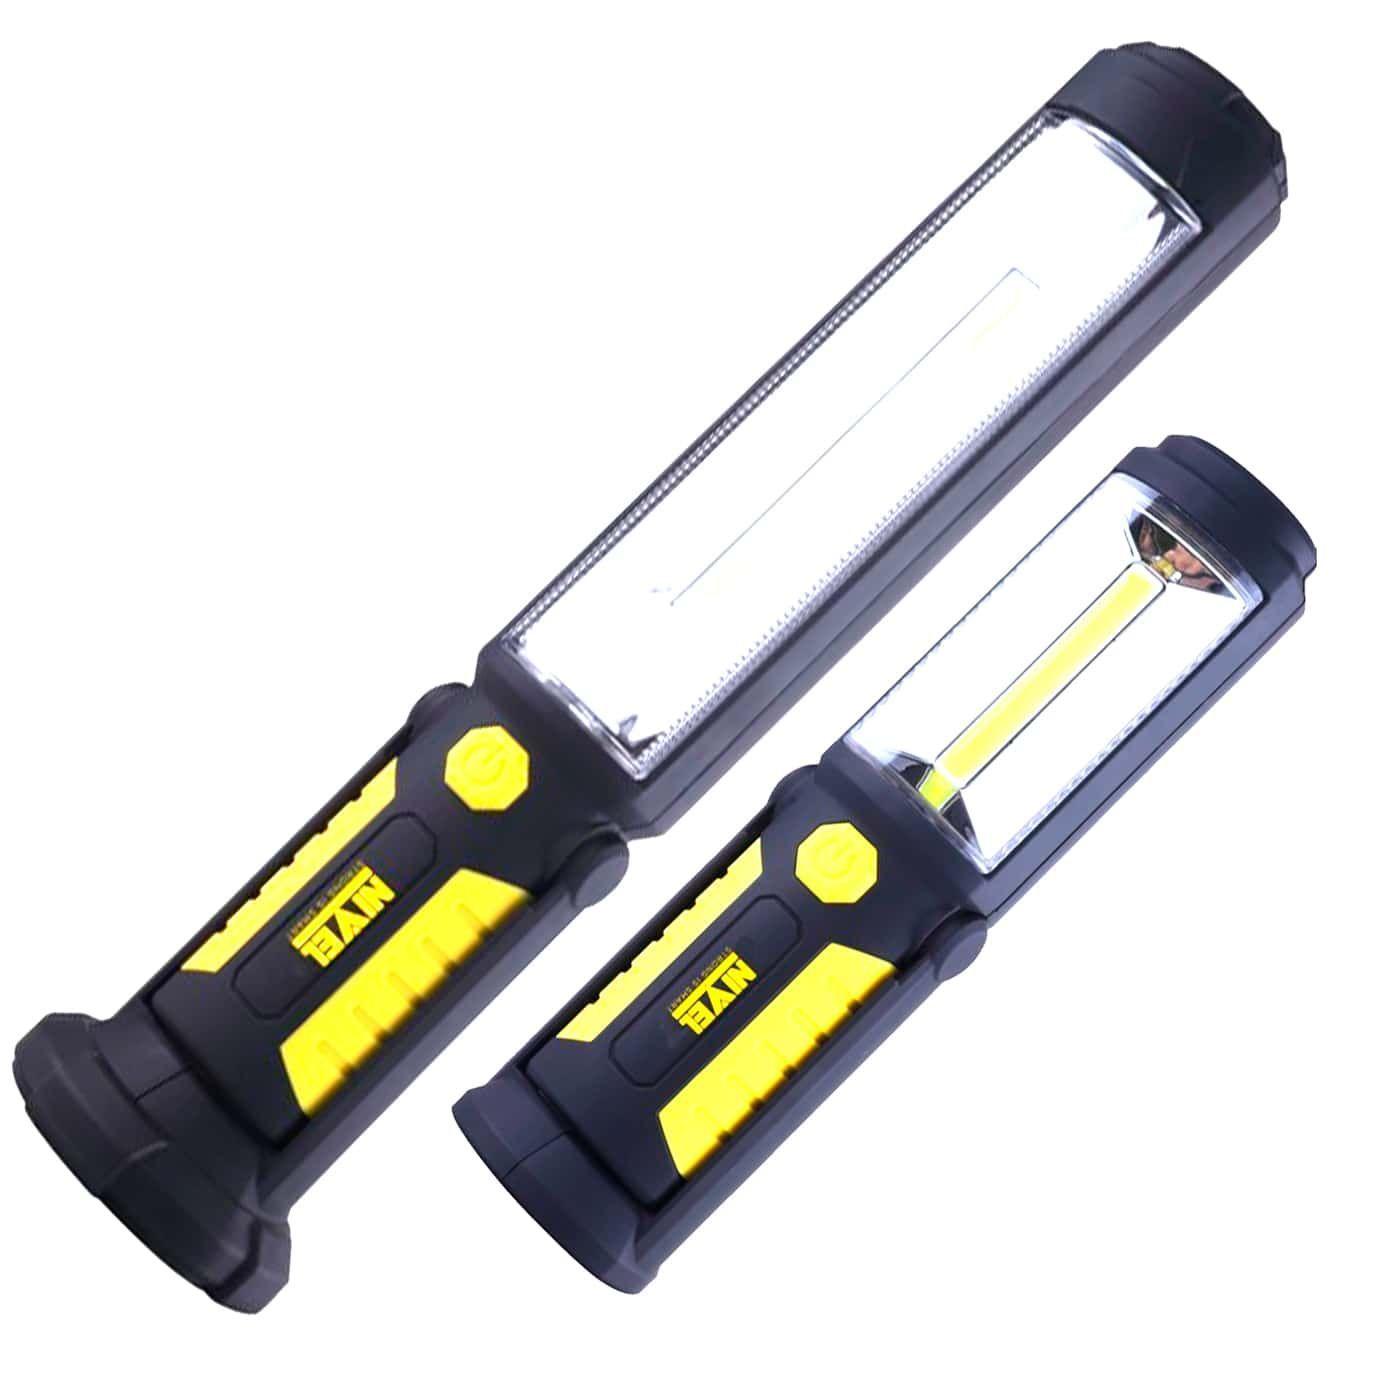 Lamparas Led De Taller Mecanico E Inspeccion De Coches Nivel Recargables Usb Led Lampara Led Taller Mecanico